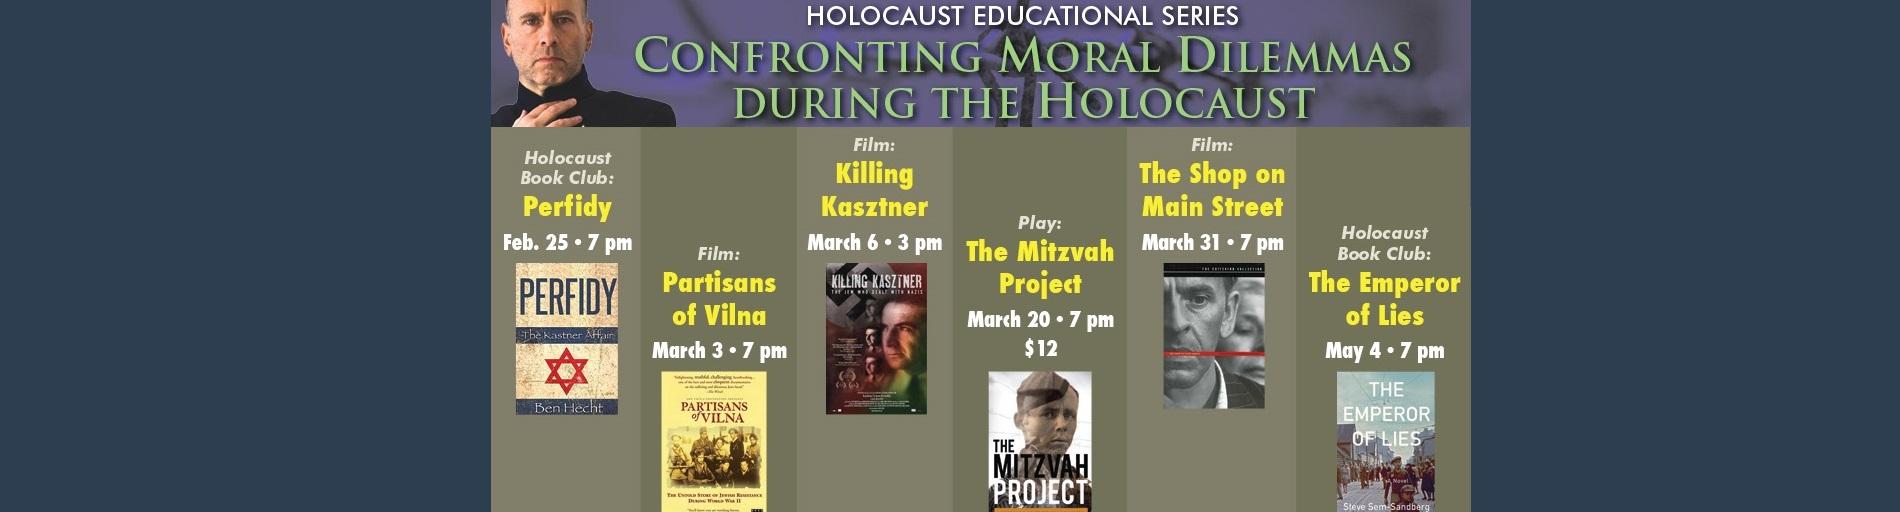 Holocaust Educational Series